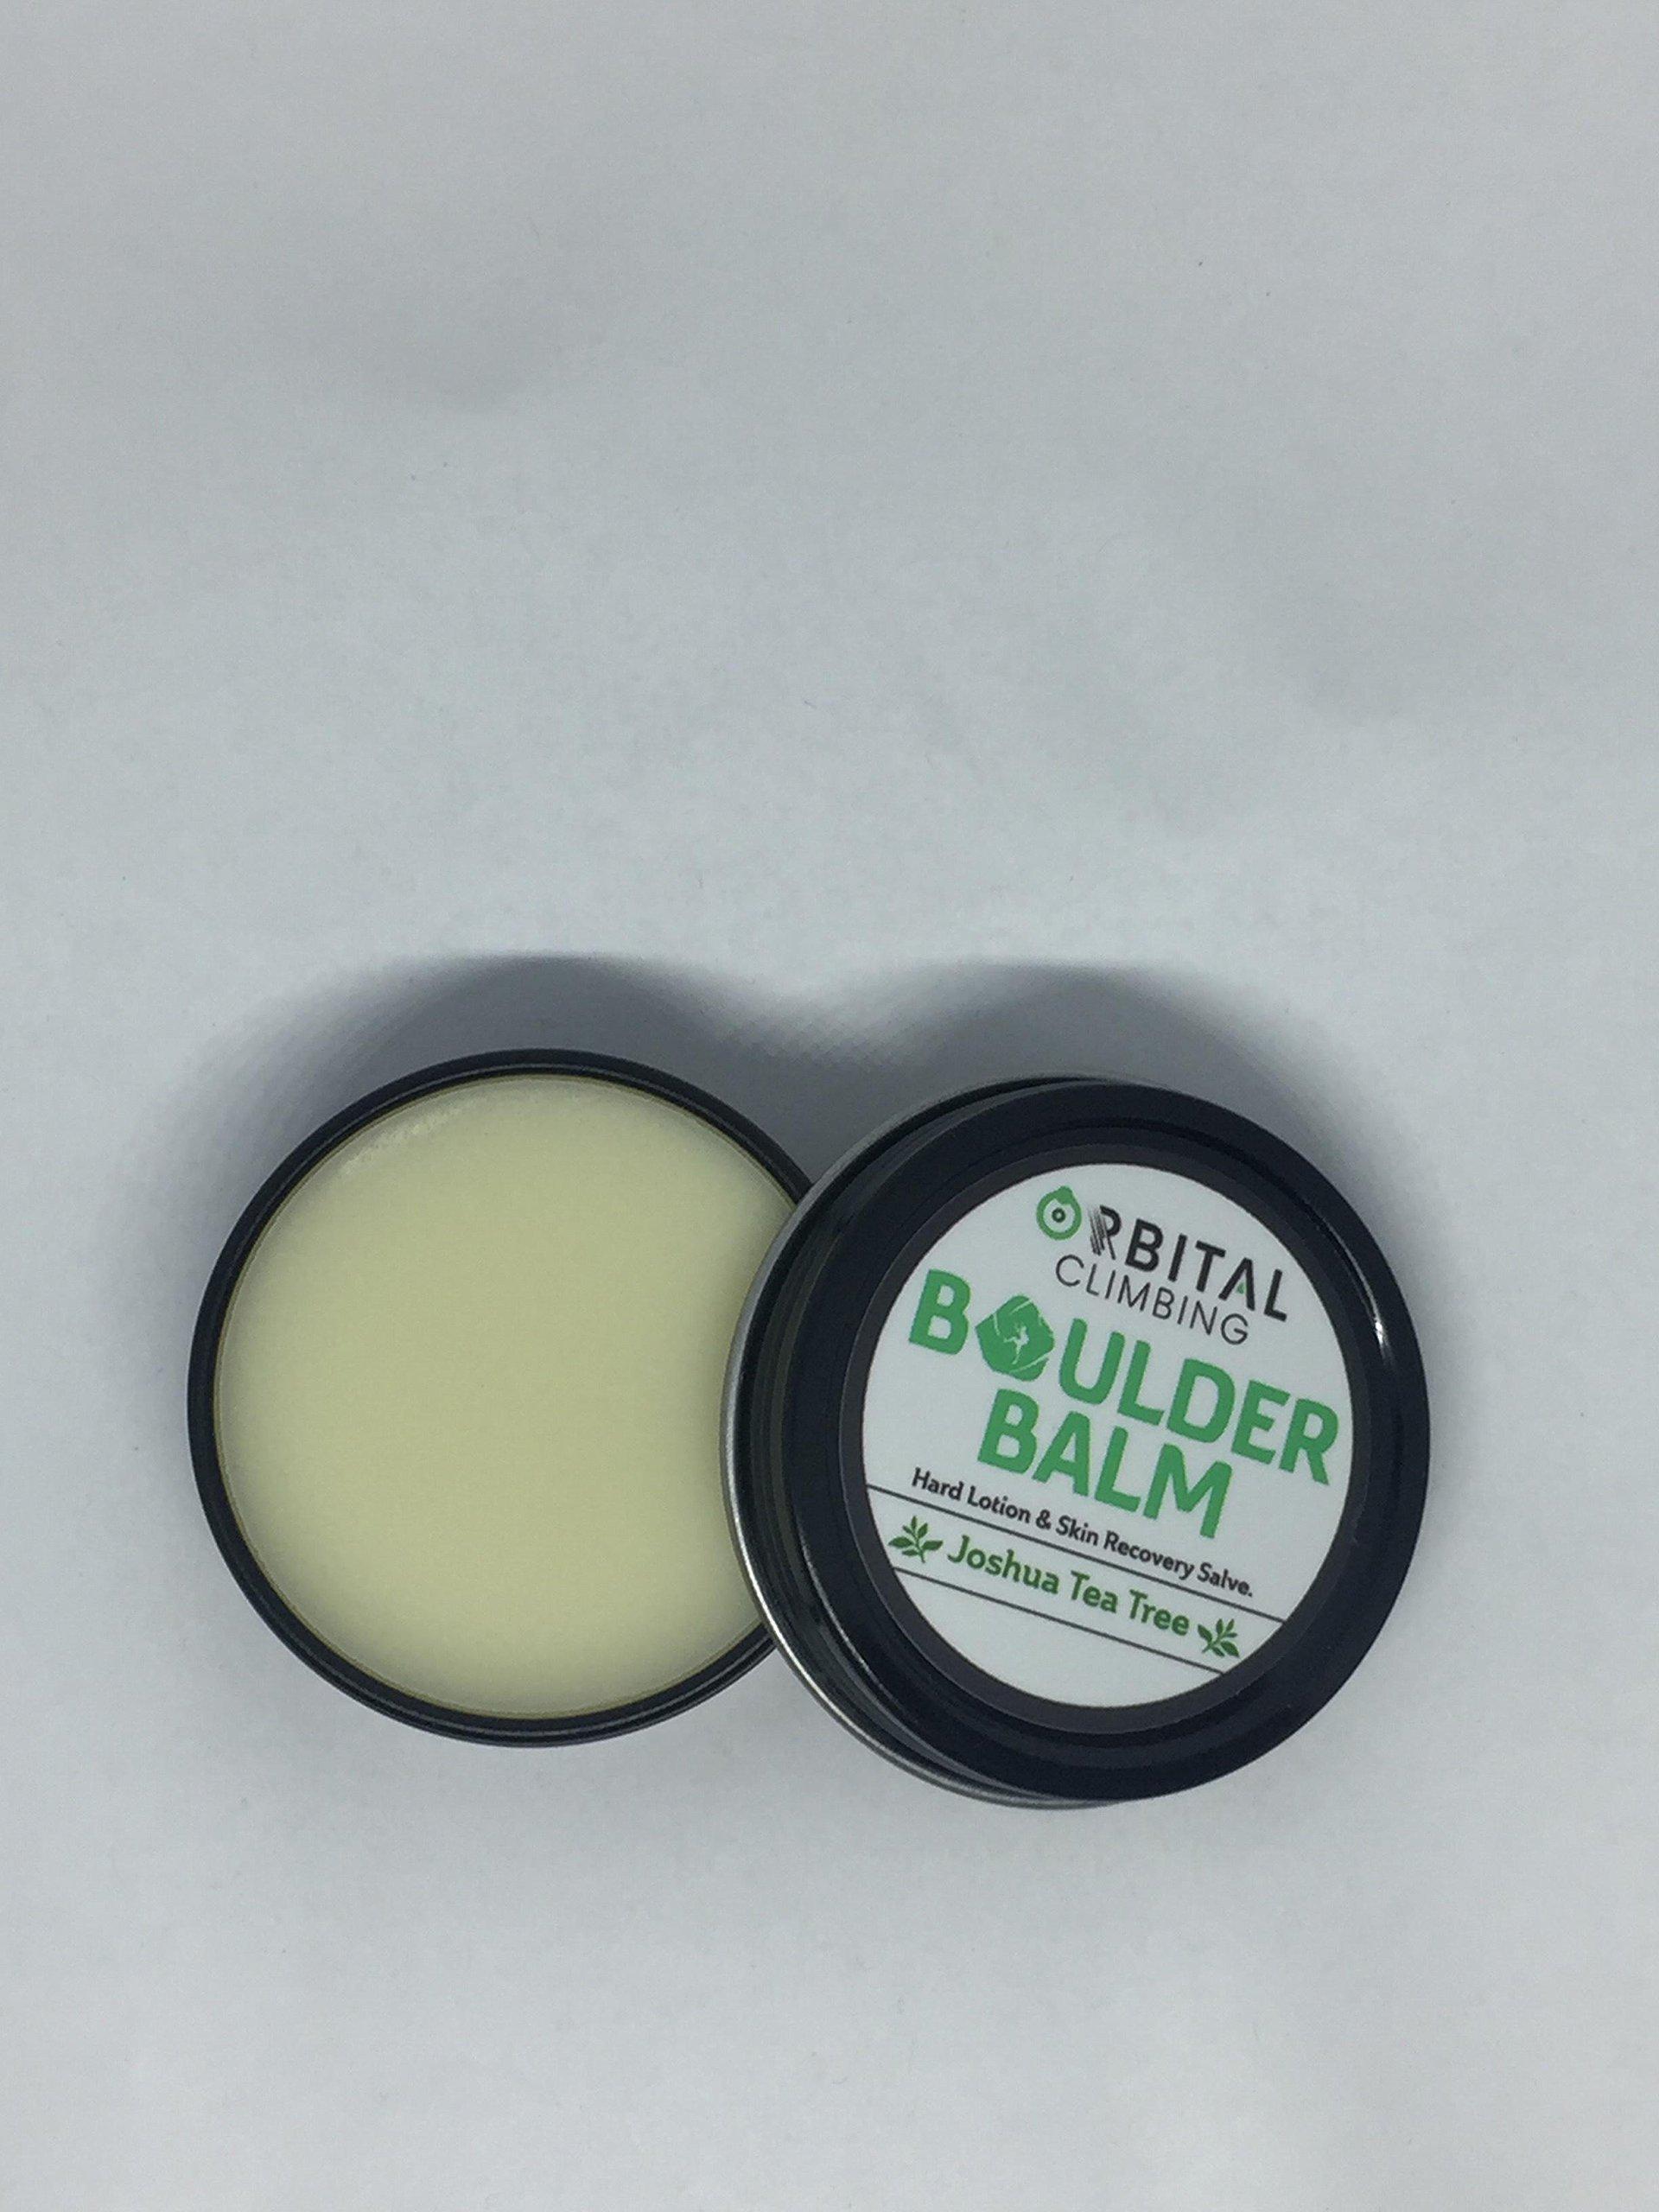 Boulder Balm: Hard Lotion Skin Recovery Salve (Joshua Tea Tree Scent) 1oz